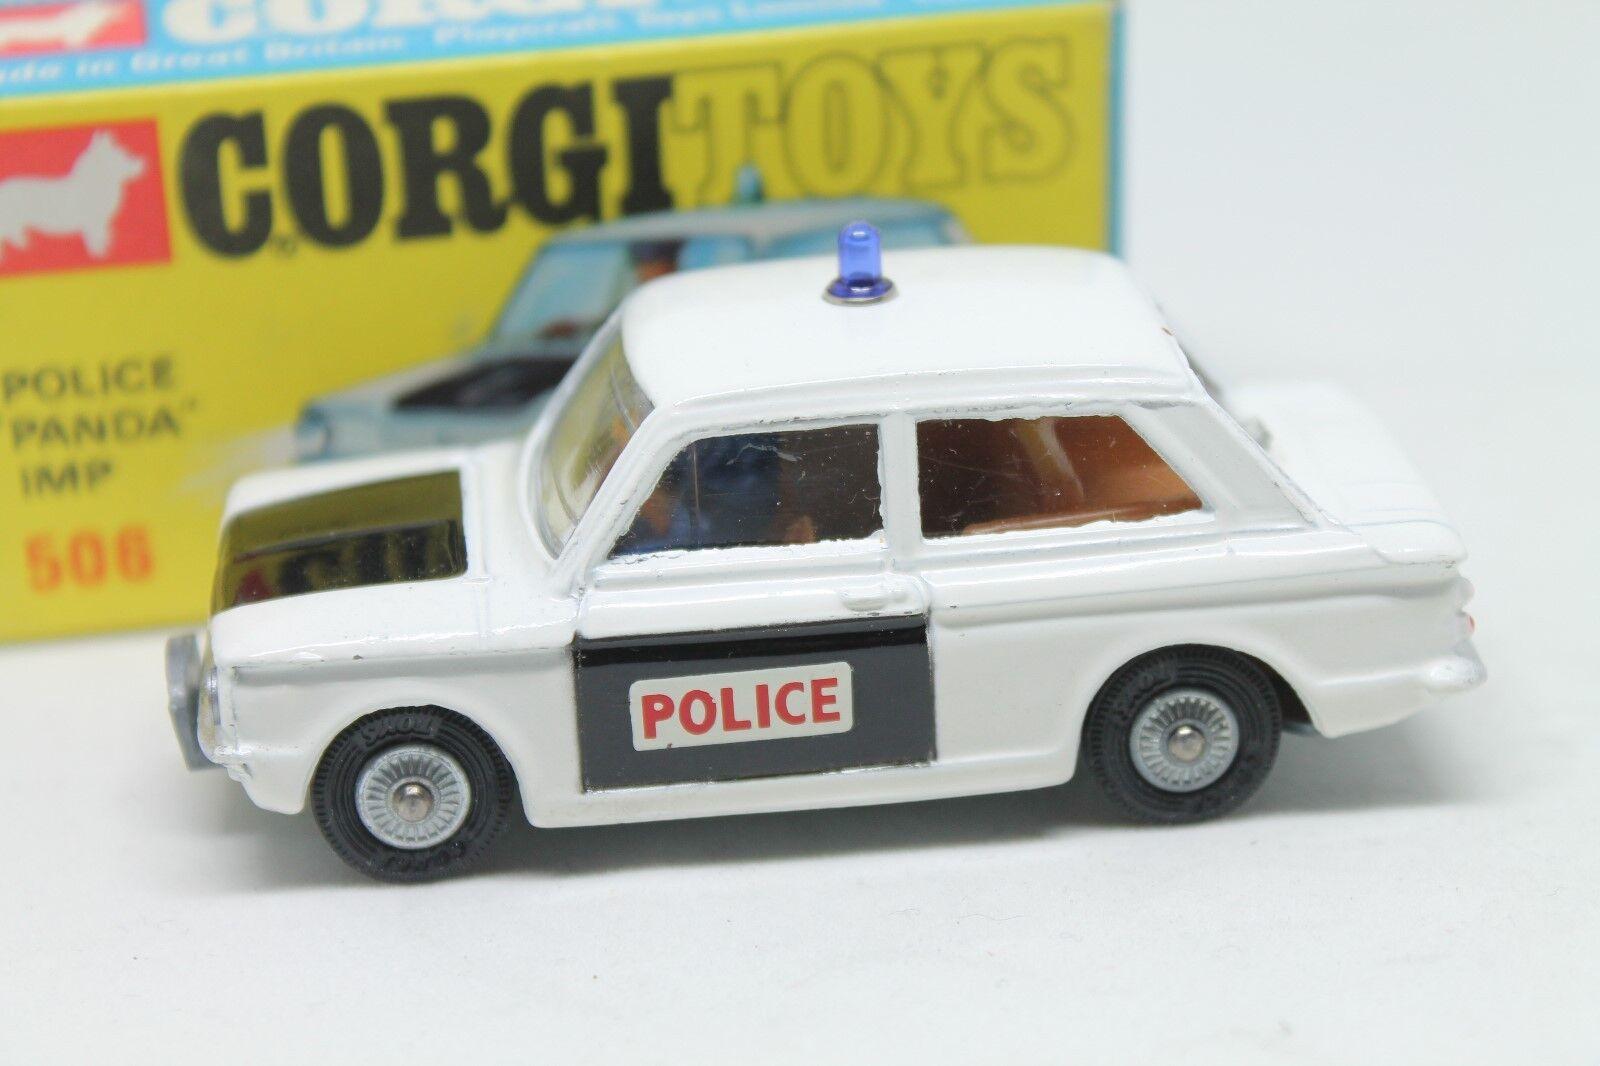 CORGI giocattoli 506  Sunbeam PeA pim  polizia  MINT  OVP  1968